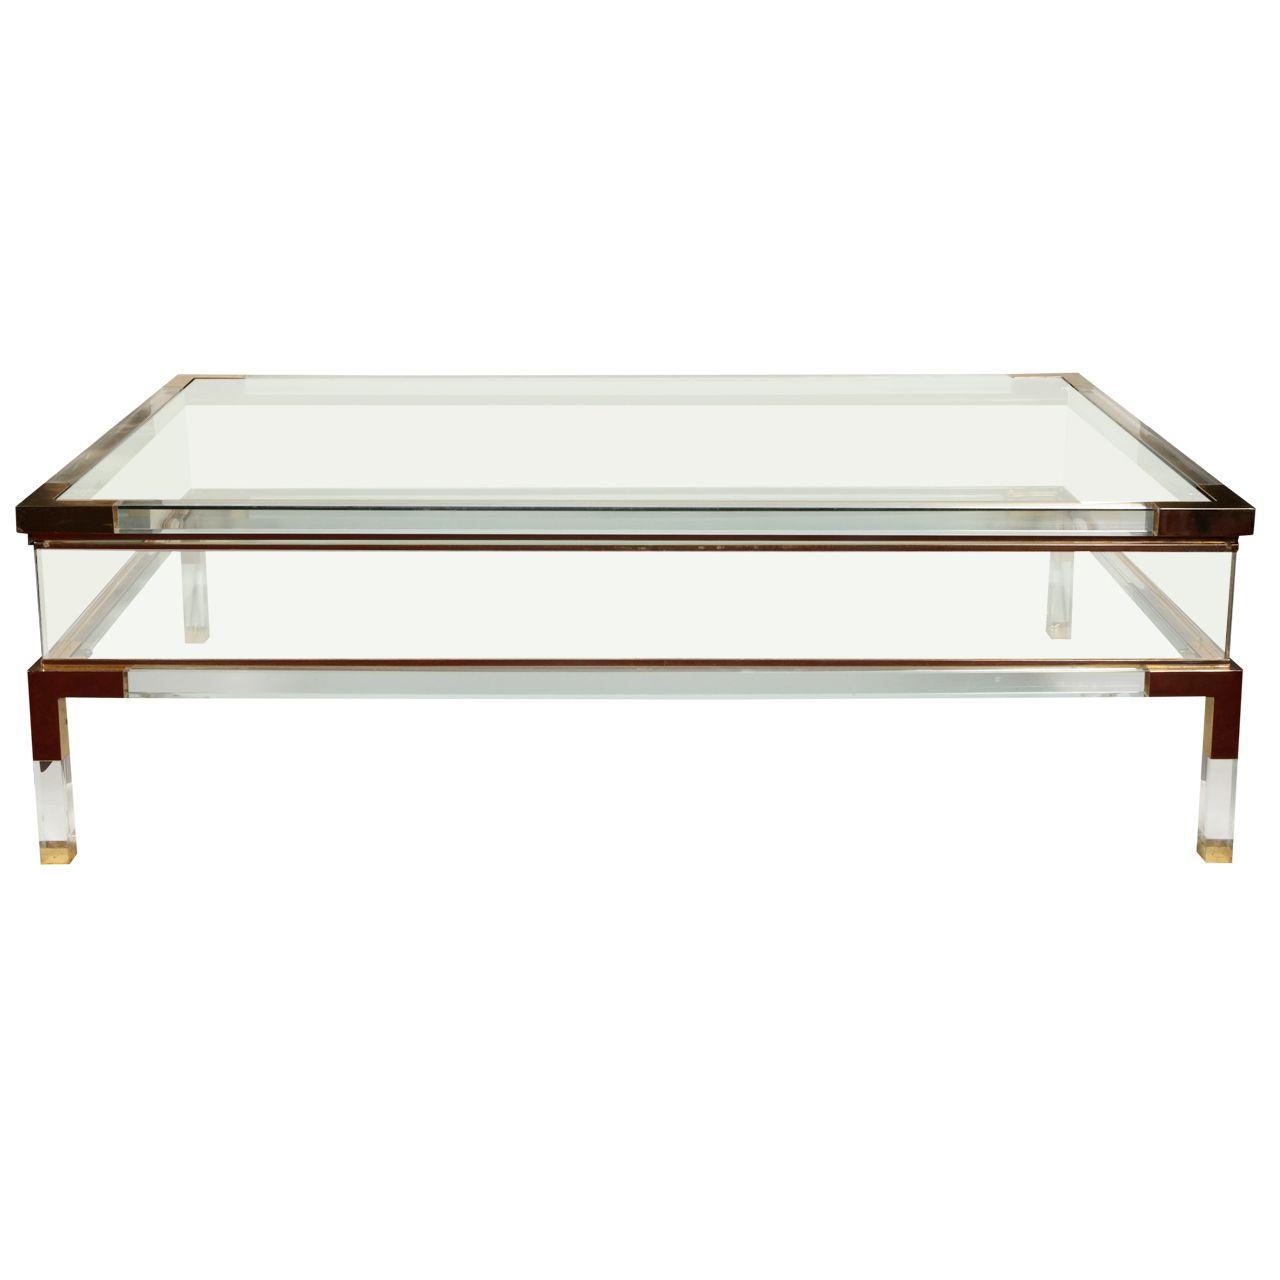 1980s Plexiglass Showcase Coffee Table